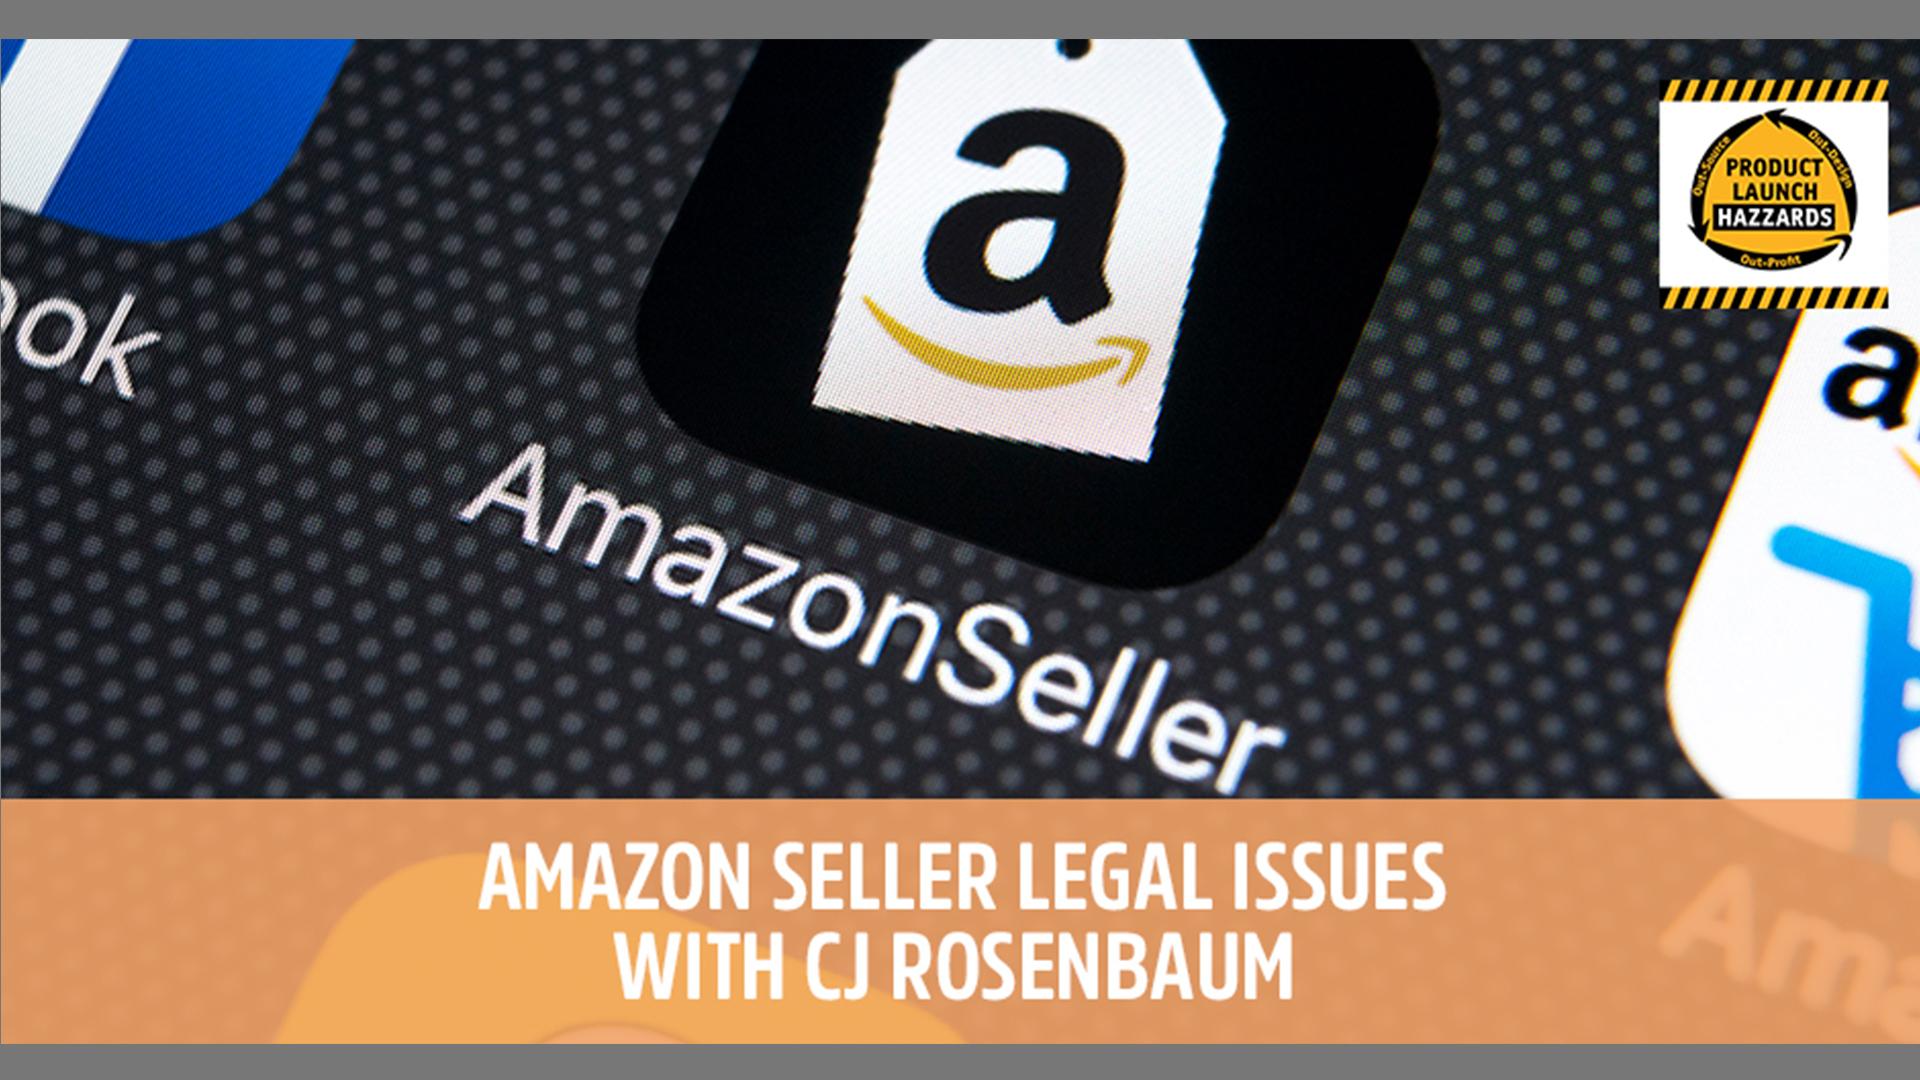 Amazon Seller Legal Issues with CJ Rosenbaum